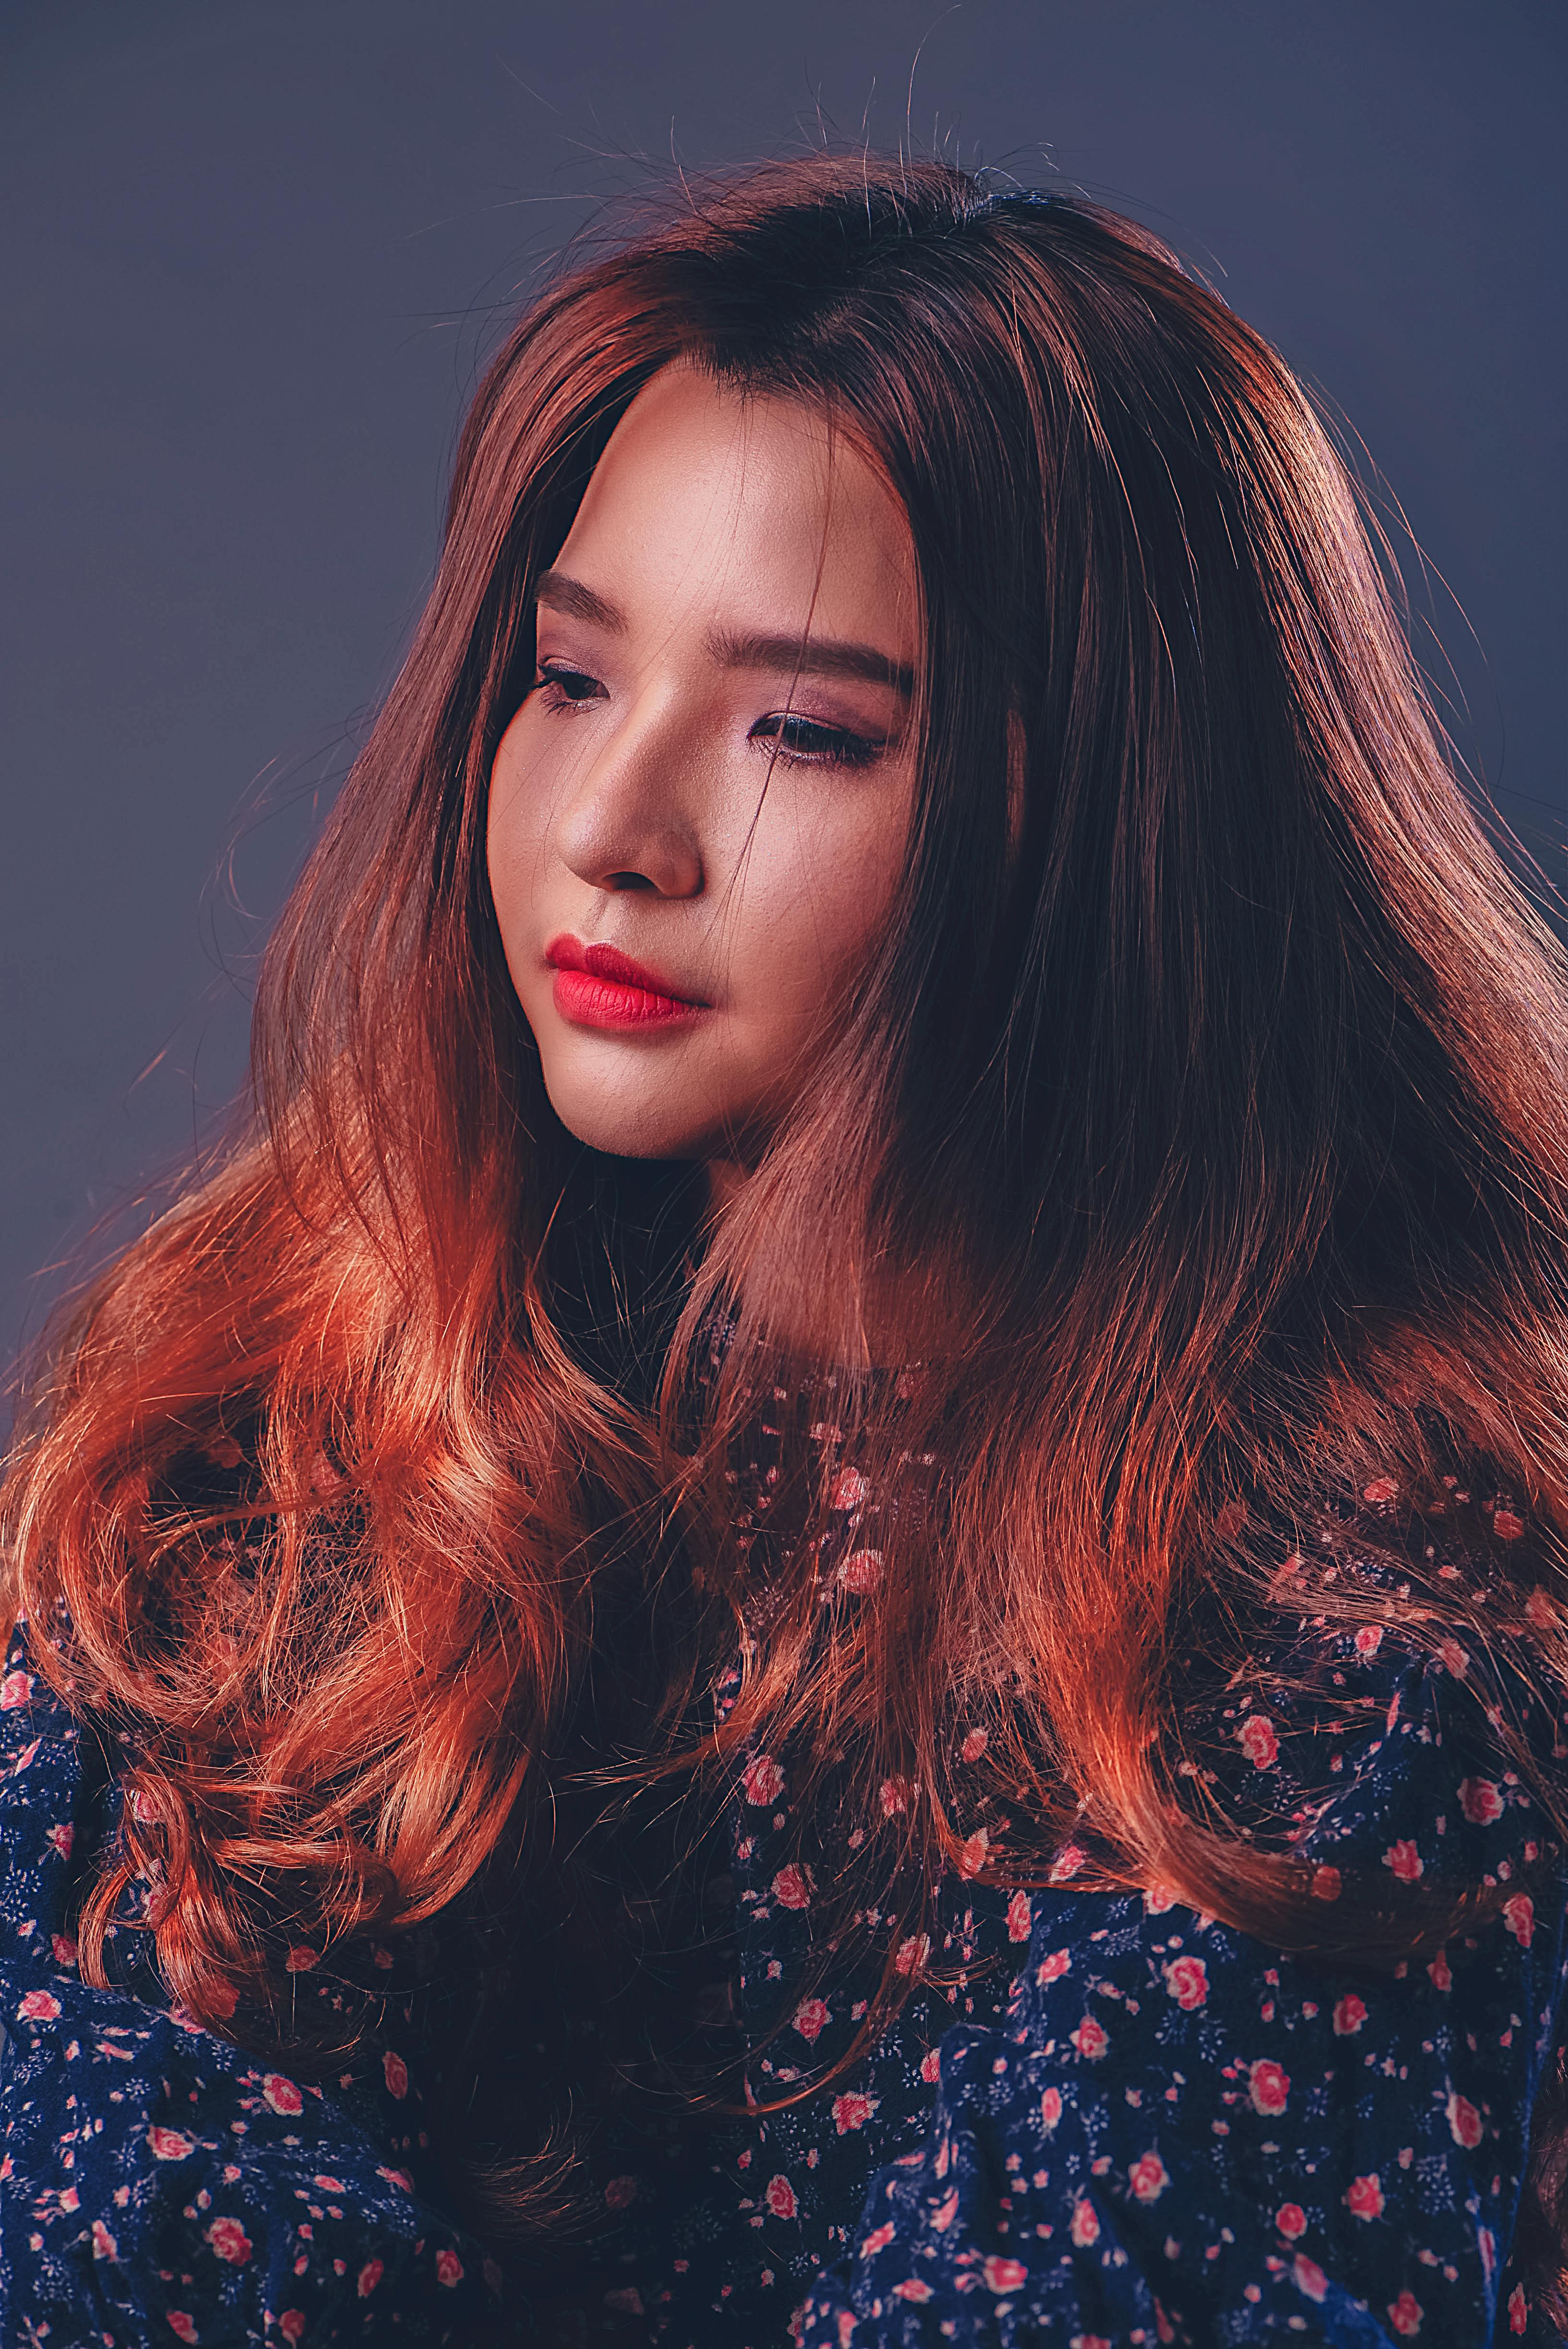 Warna rambut manusia wanita bibir hairstyle rambut merah rambut panjang pewarnaan rambut model fesyen dahi rambut coklat rambut hitam rambut